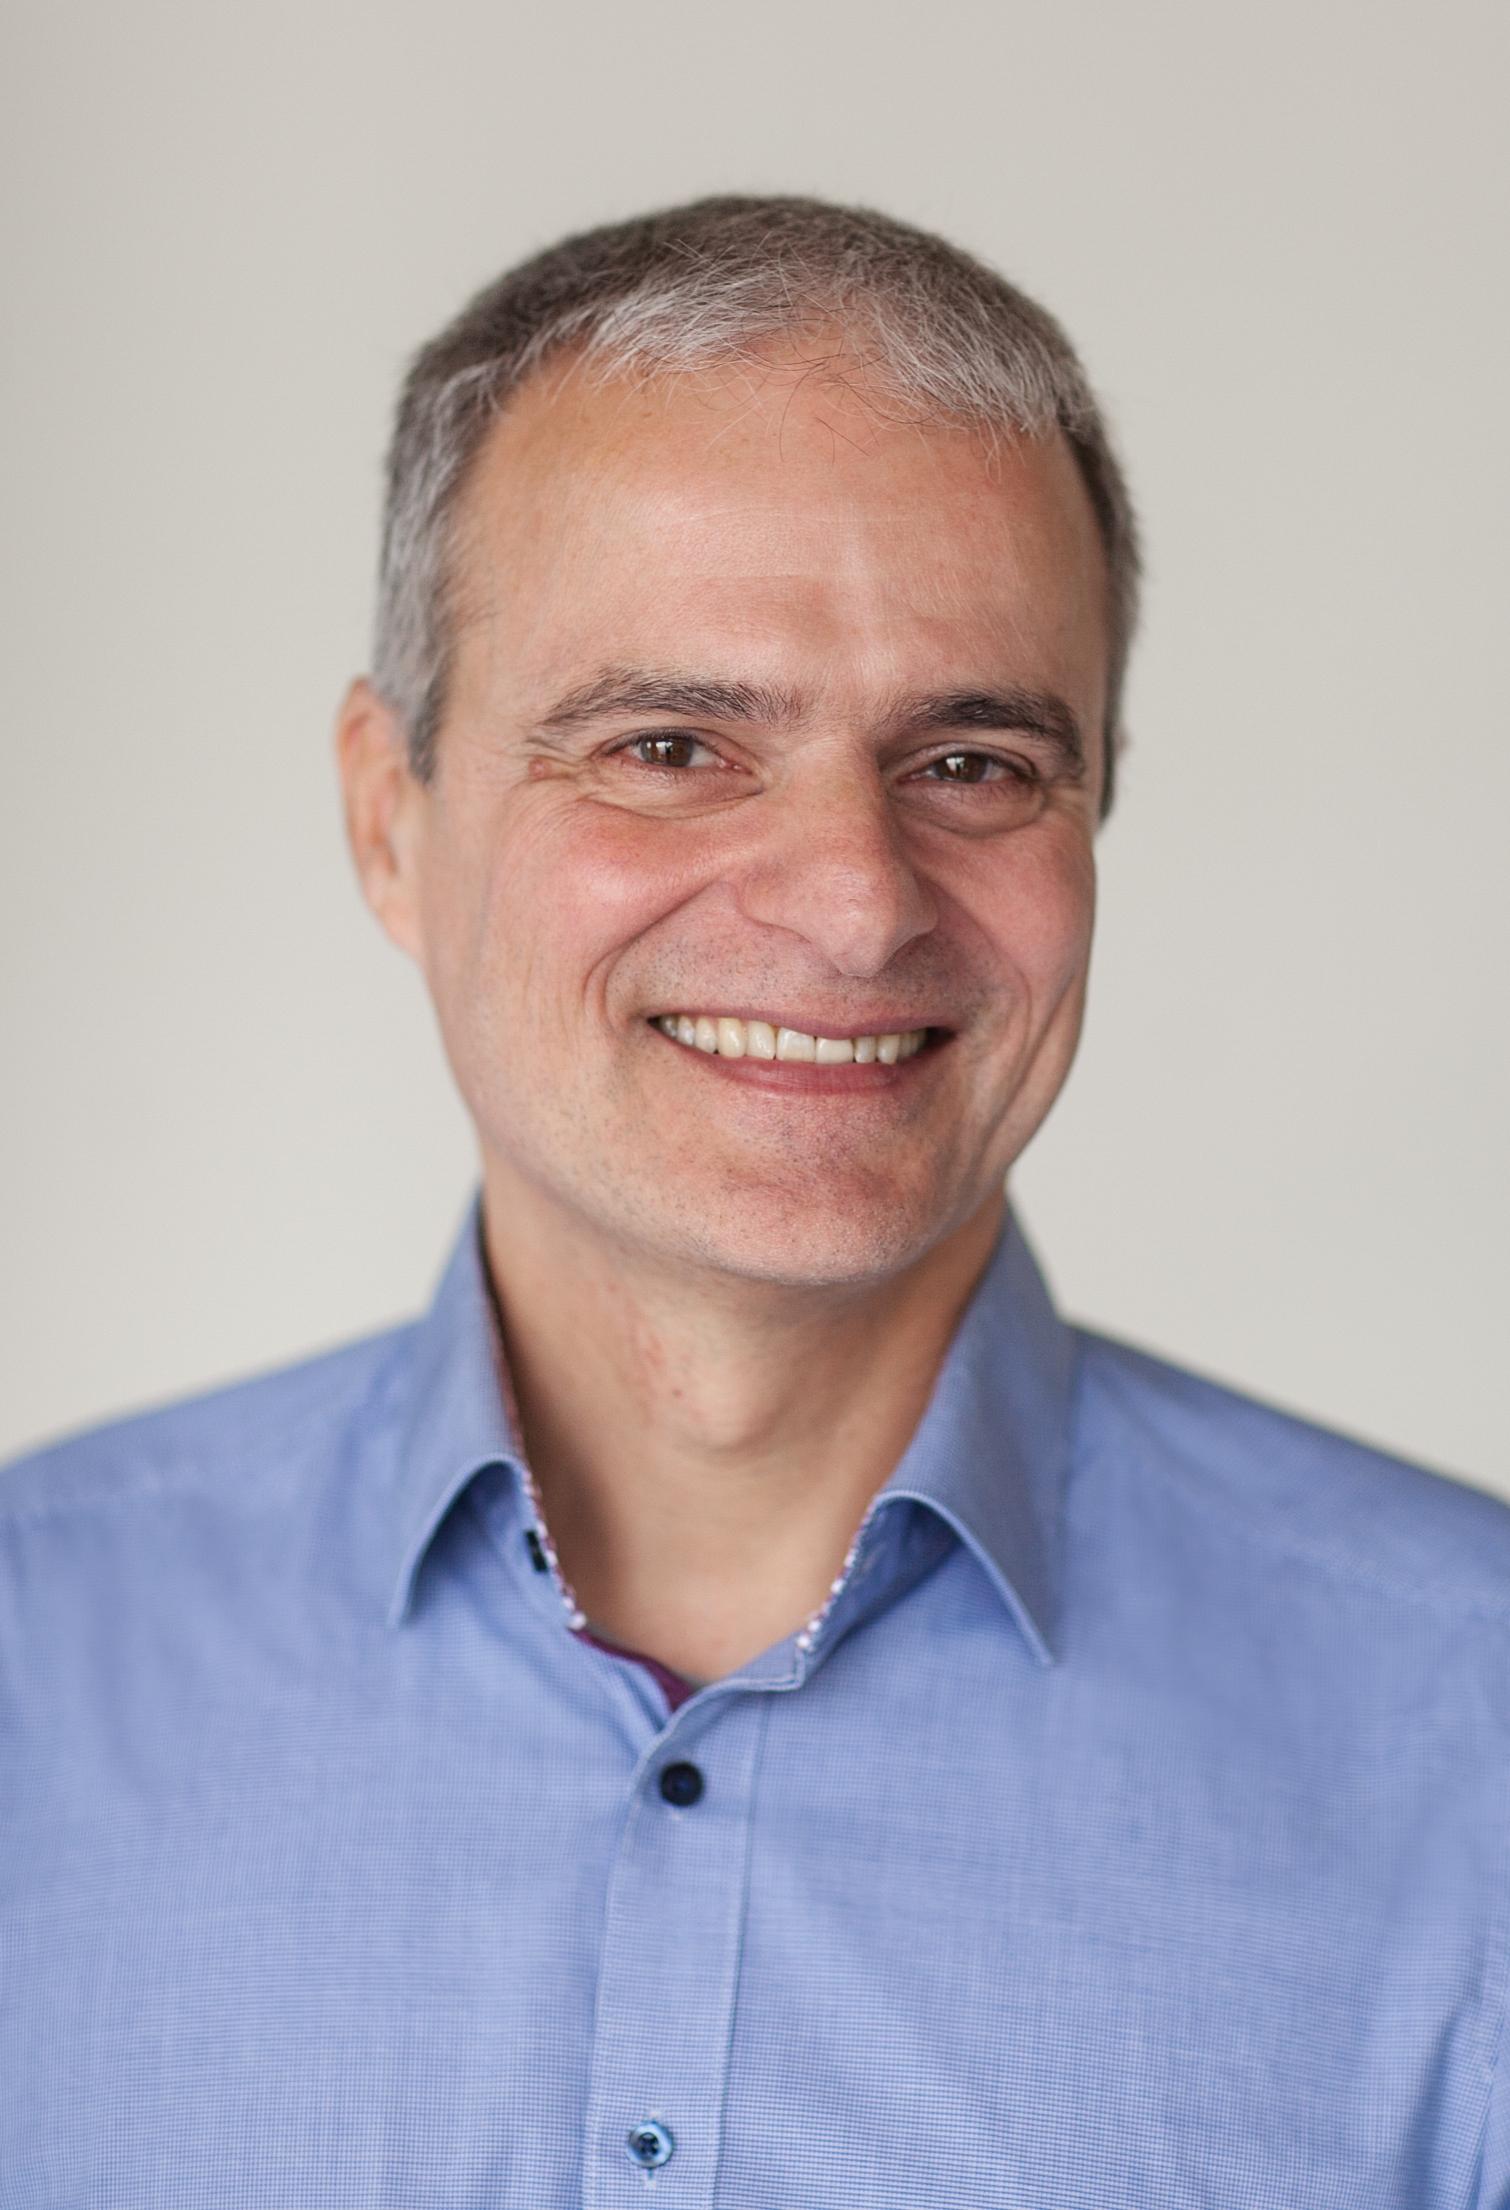 Michael Uhl